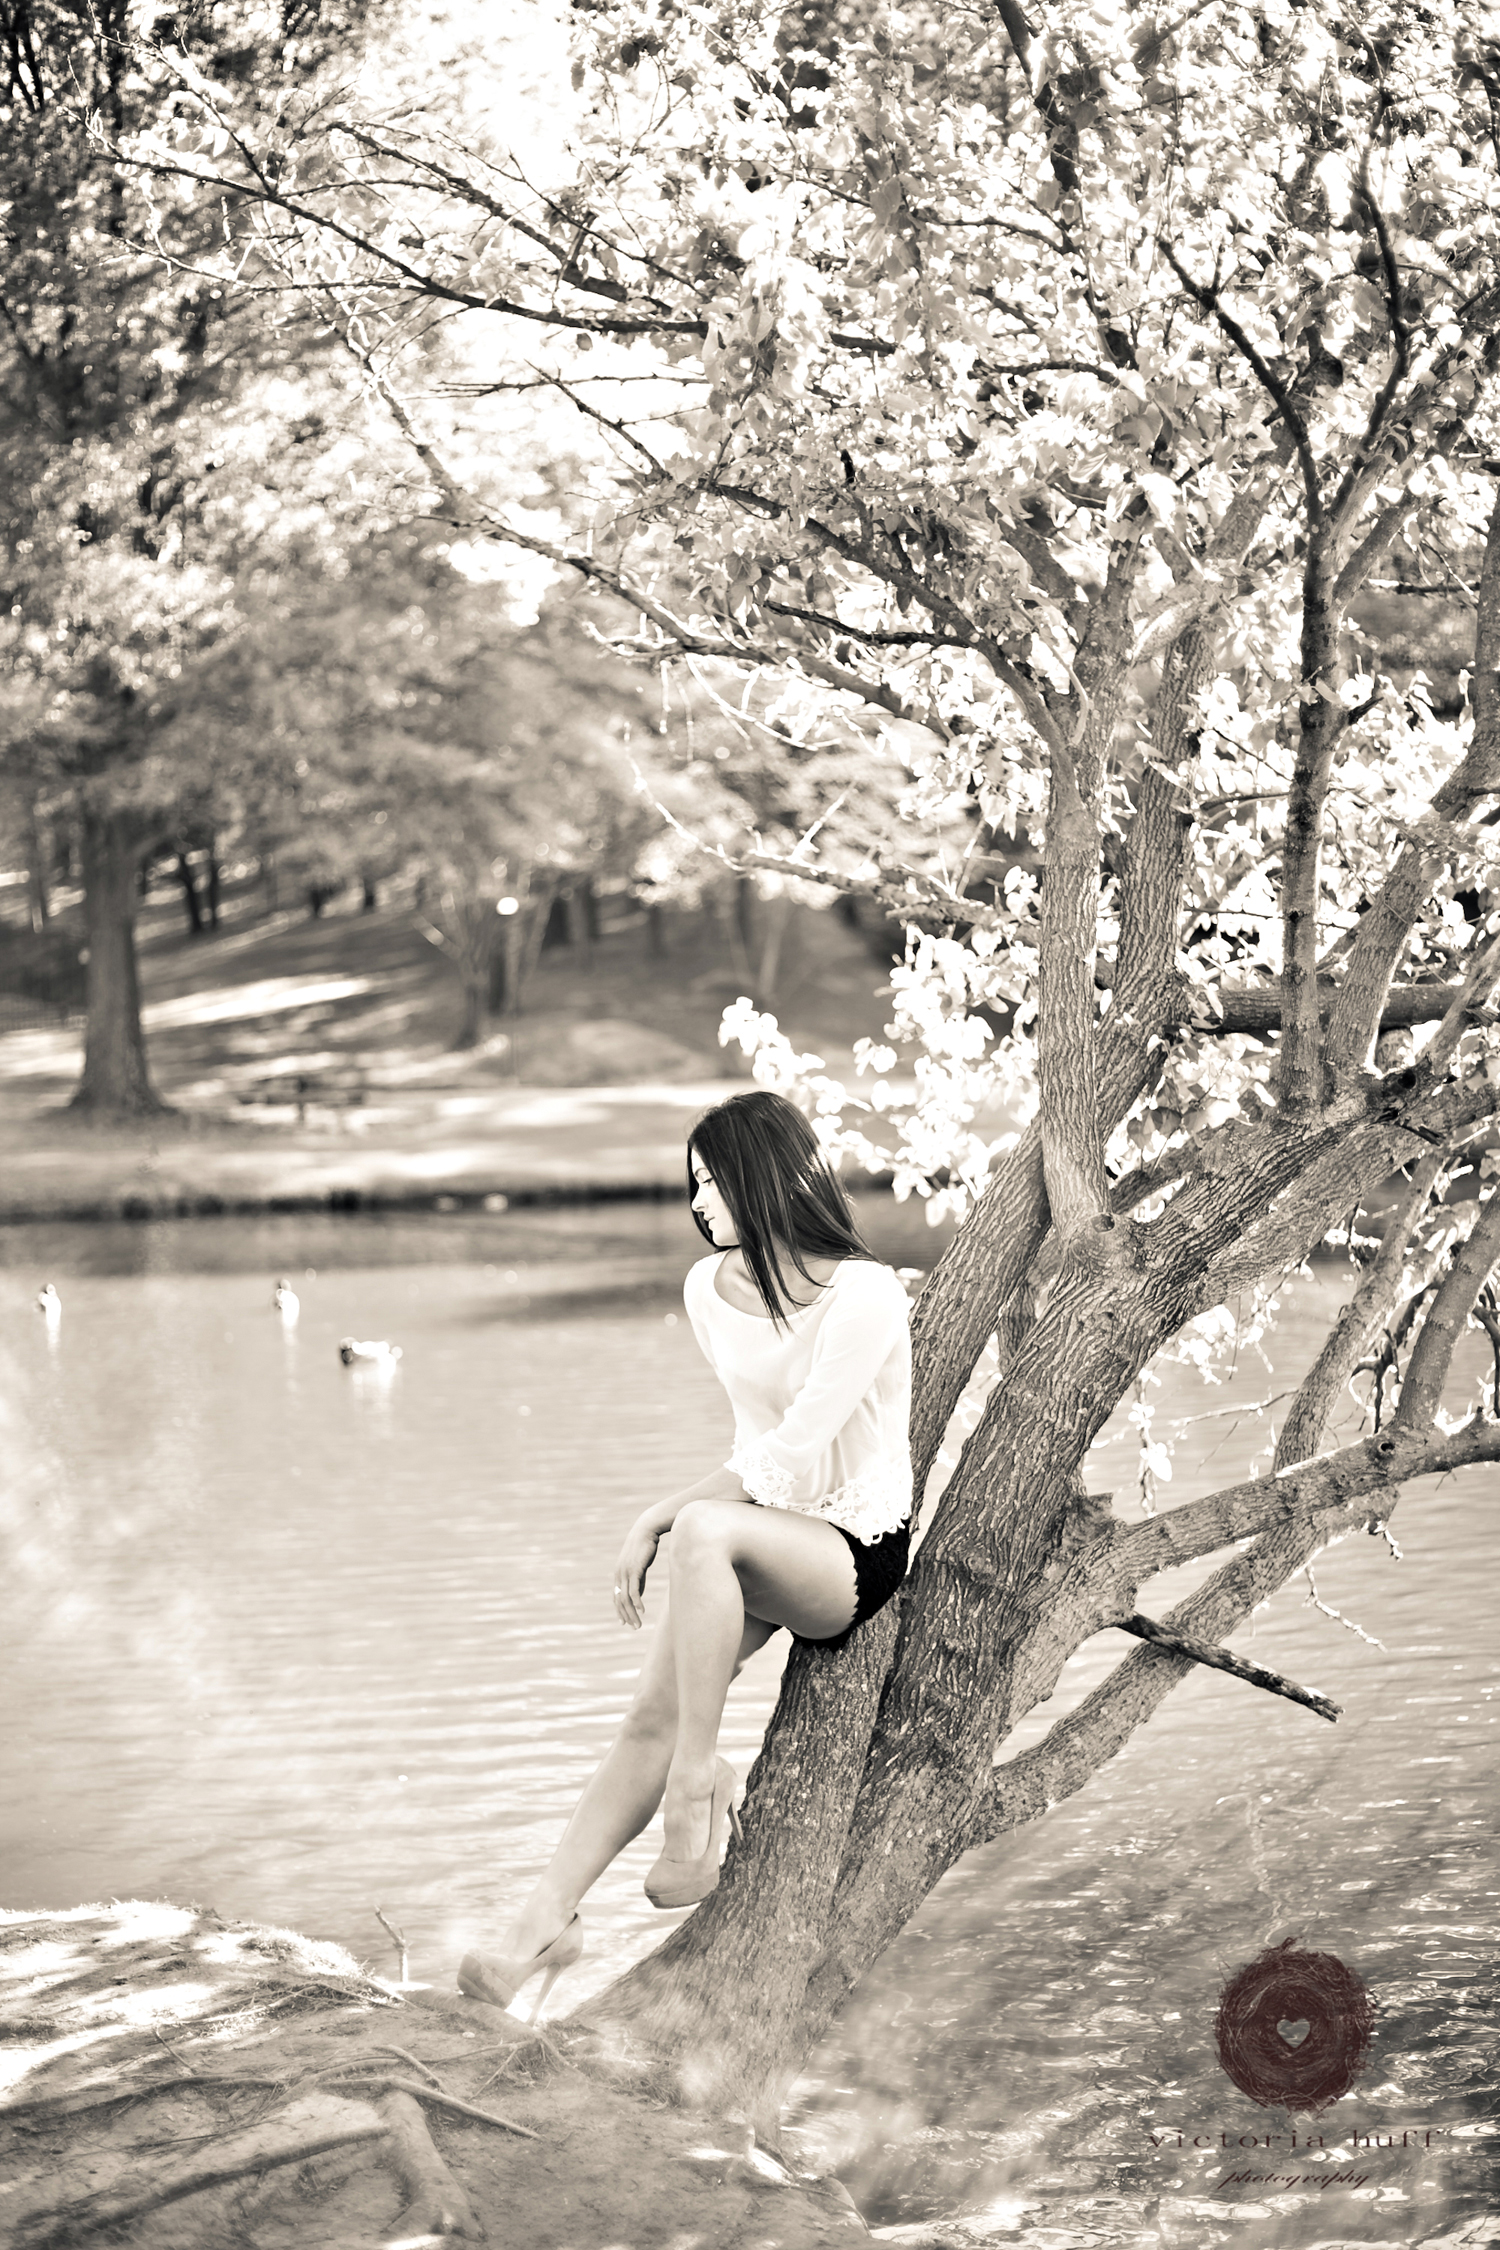 Nicole-Acevedo-Atlanta-Georgia-Lenox-Pond-Vintage-Photography-062.jpg